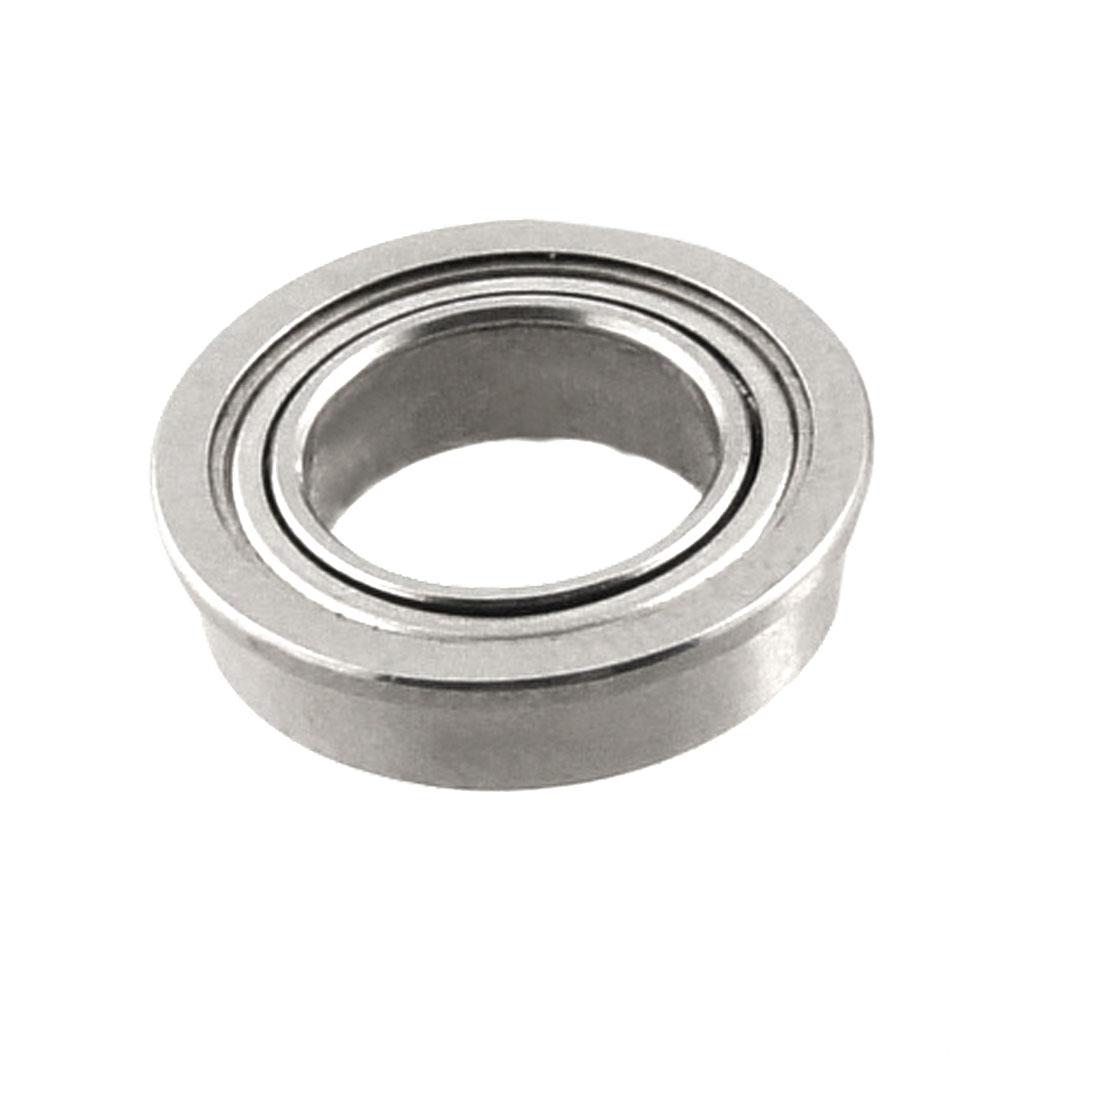 11mm x 7mm x 3mm Shield Ball Bearing Silver Tone